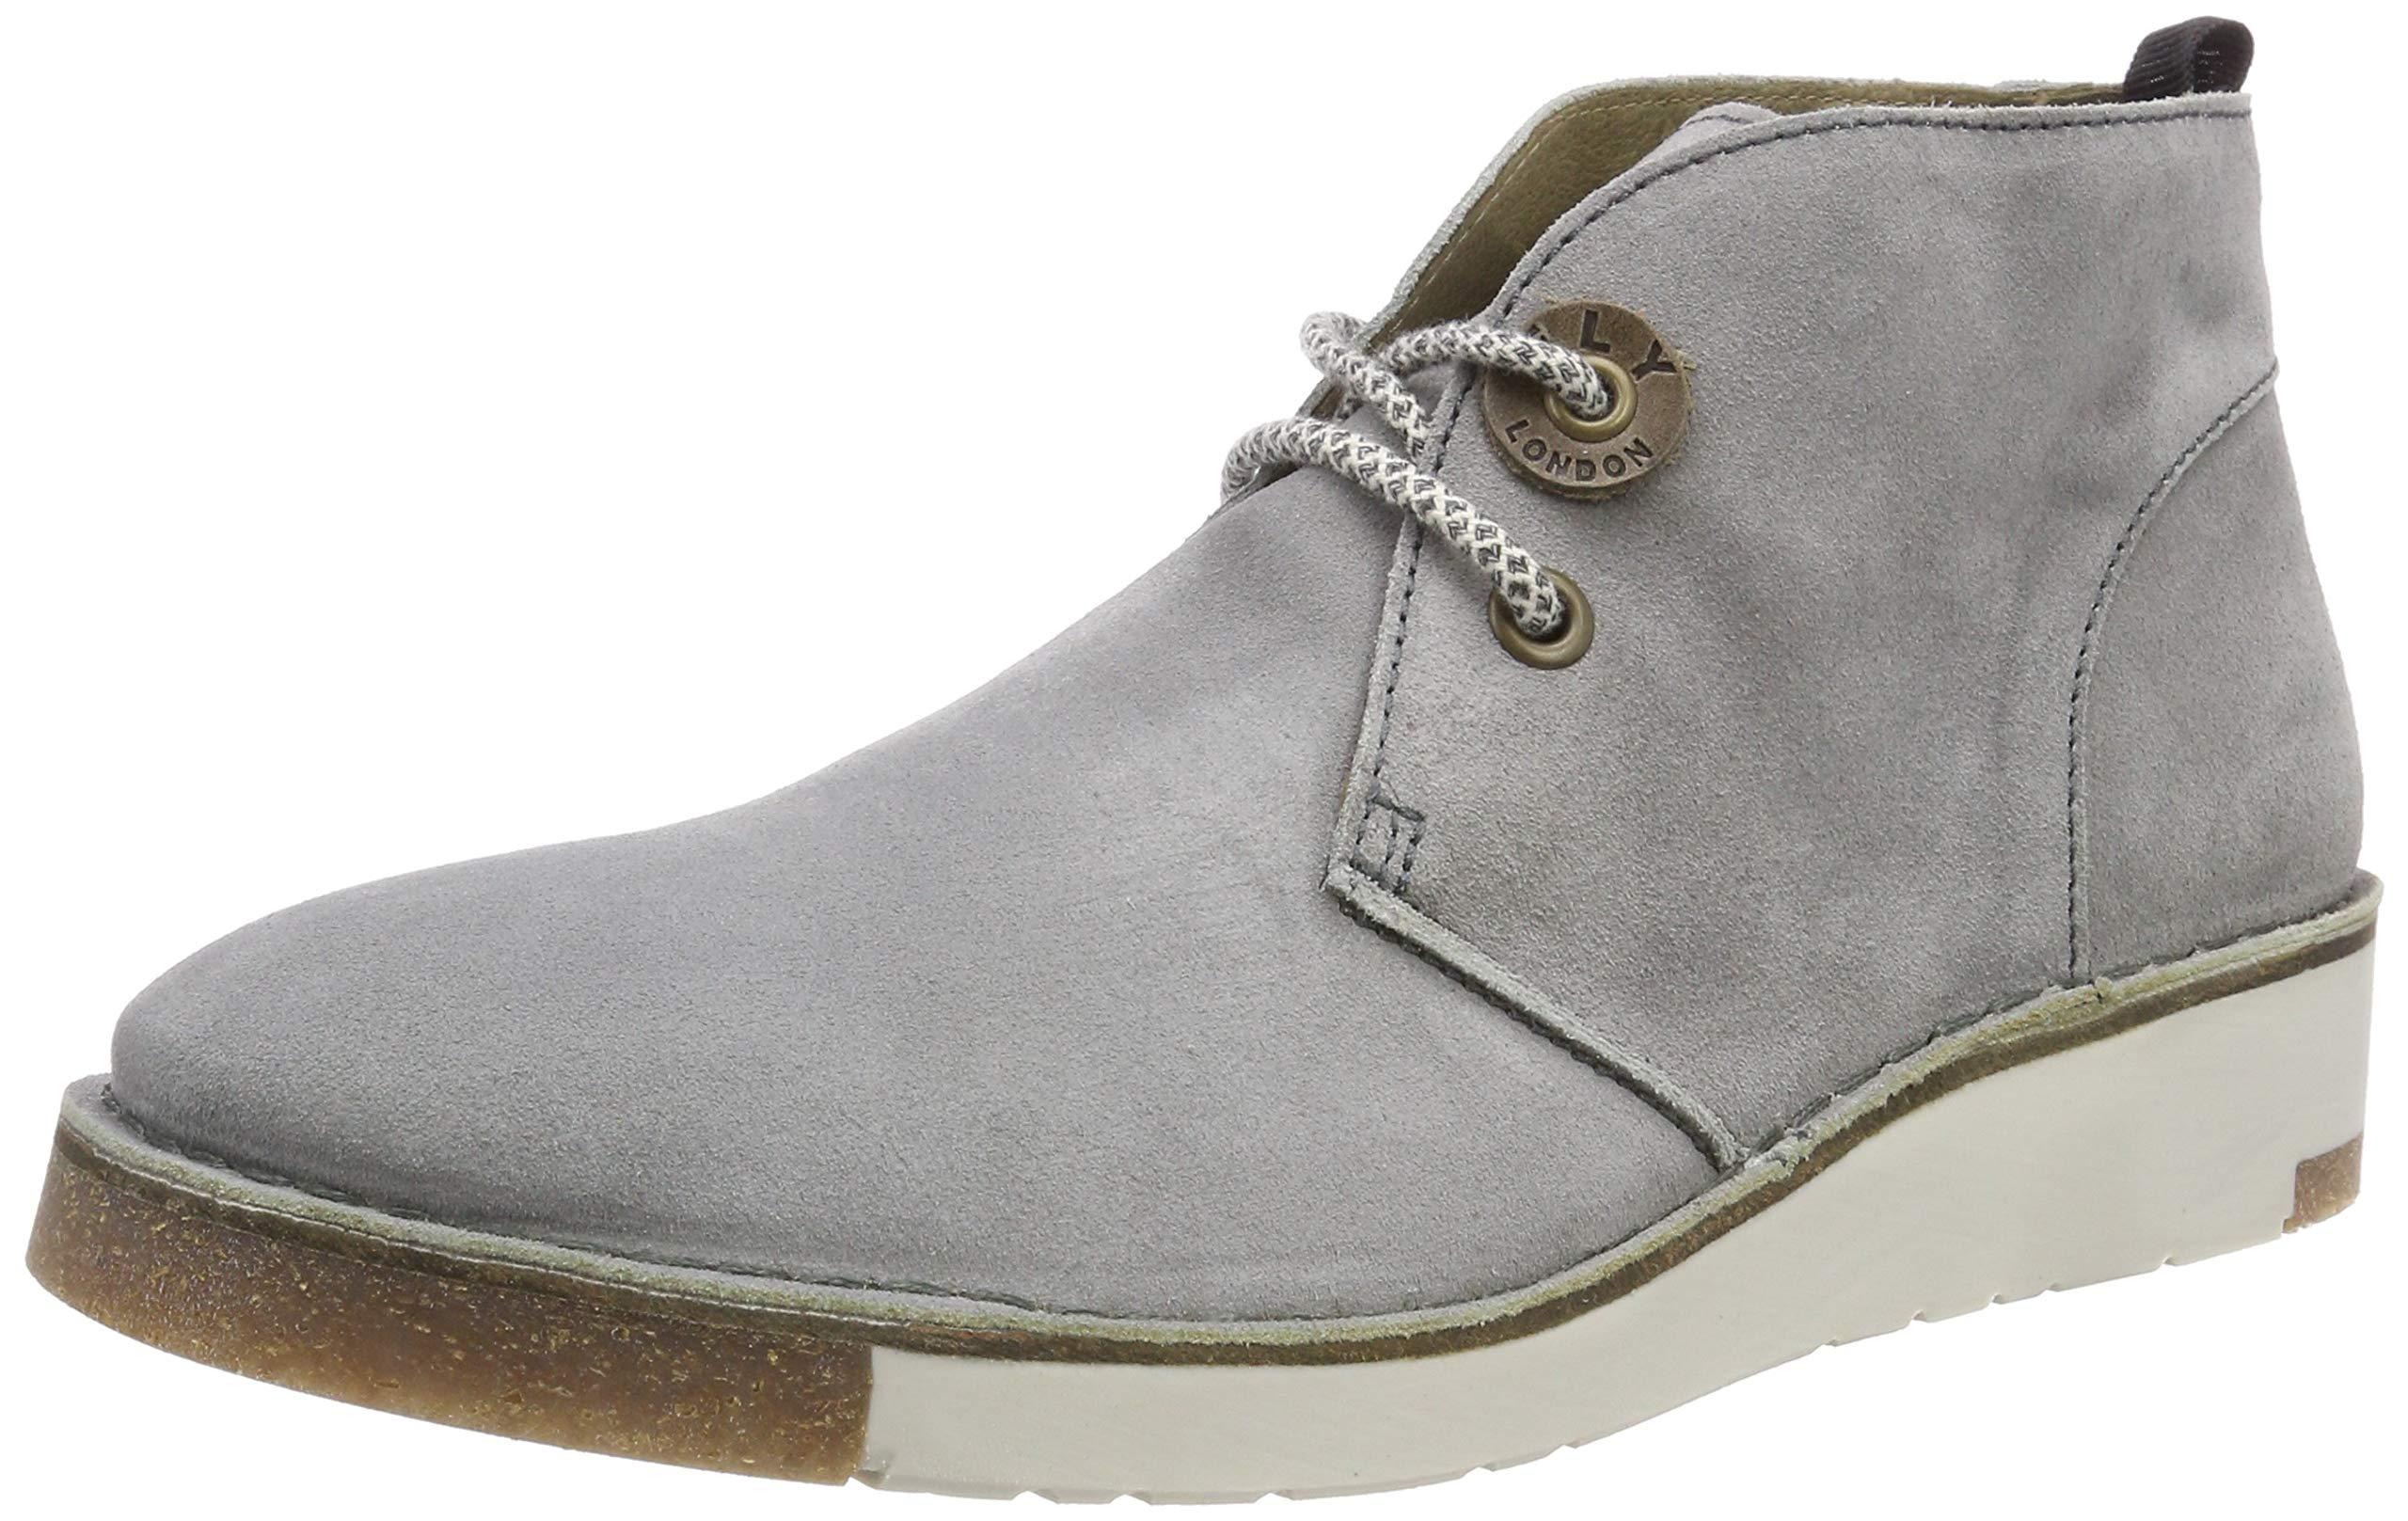 00344 Eu Grey Boots HommeGrislt London Fly Swor993flyDesert QoWBreECdx